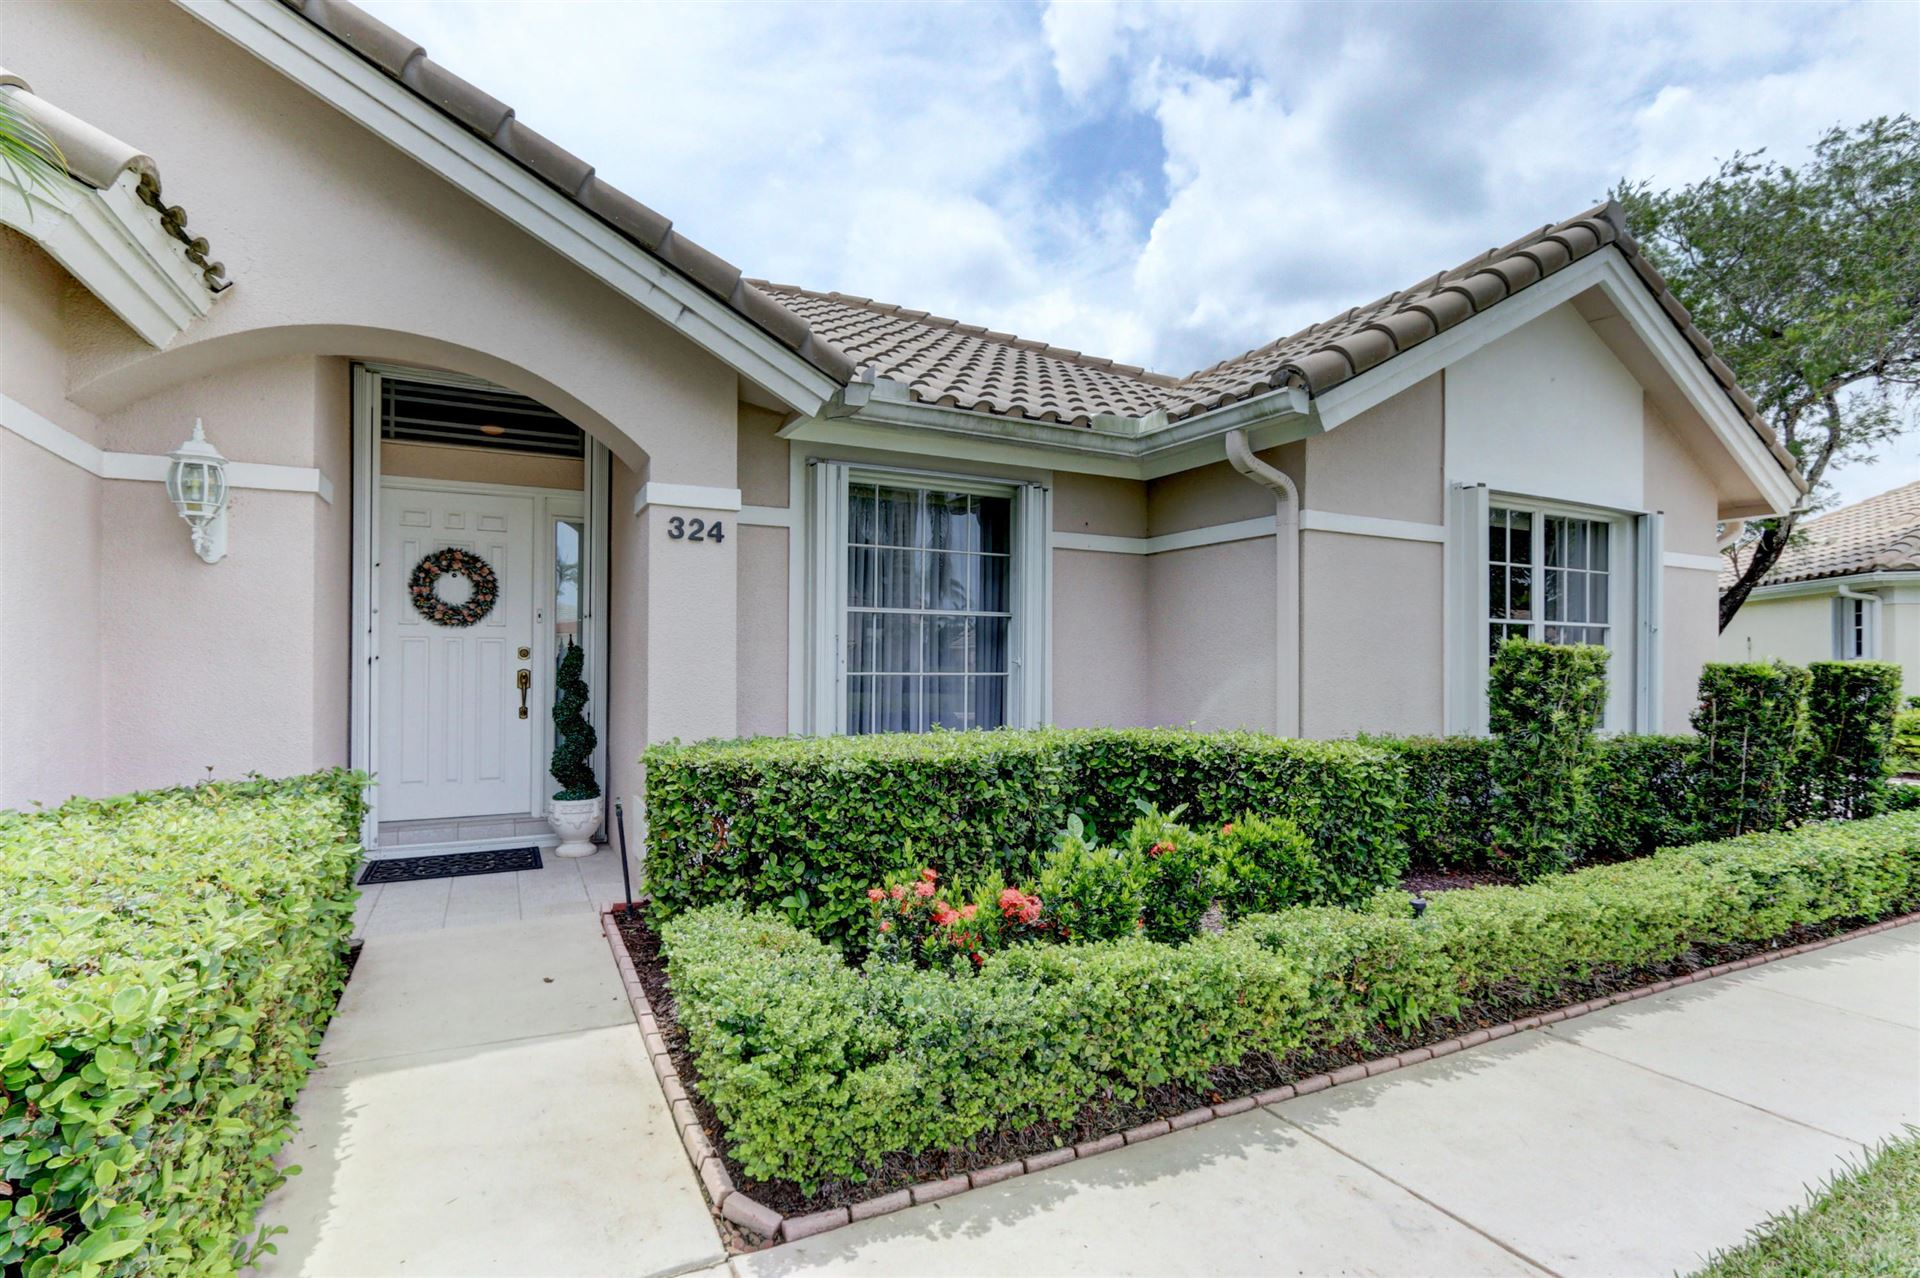 Photo of 324 Eagleton Golf Drive, Palm Beach Gardens, FL 33418 (MLS # RX-10649023)